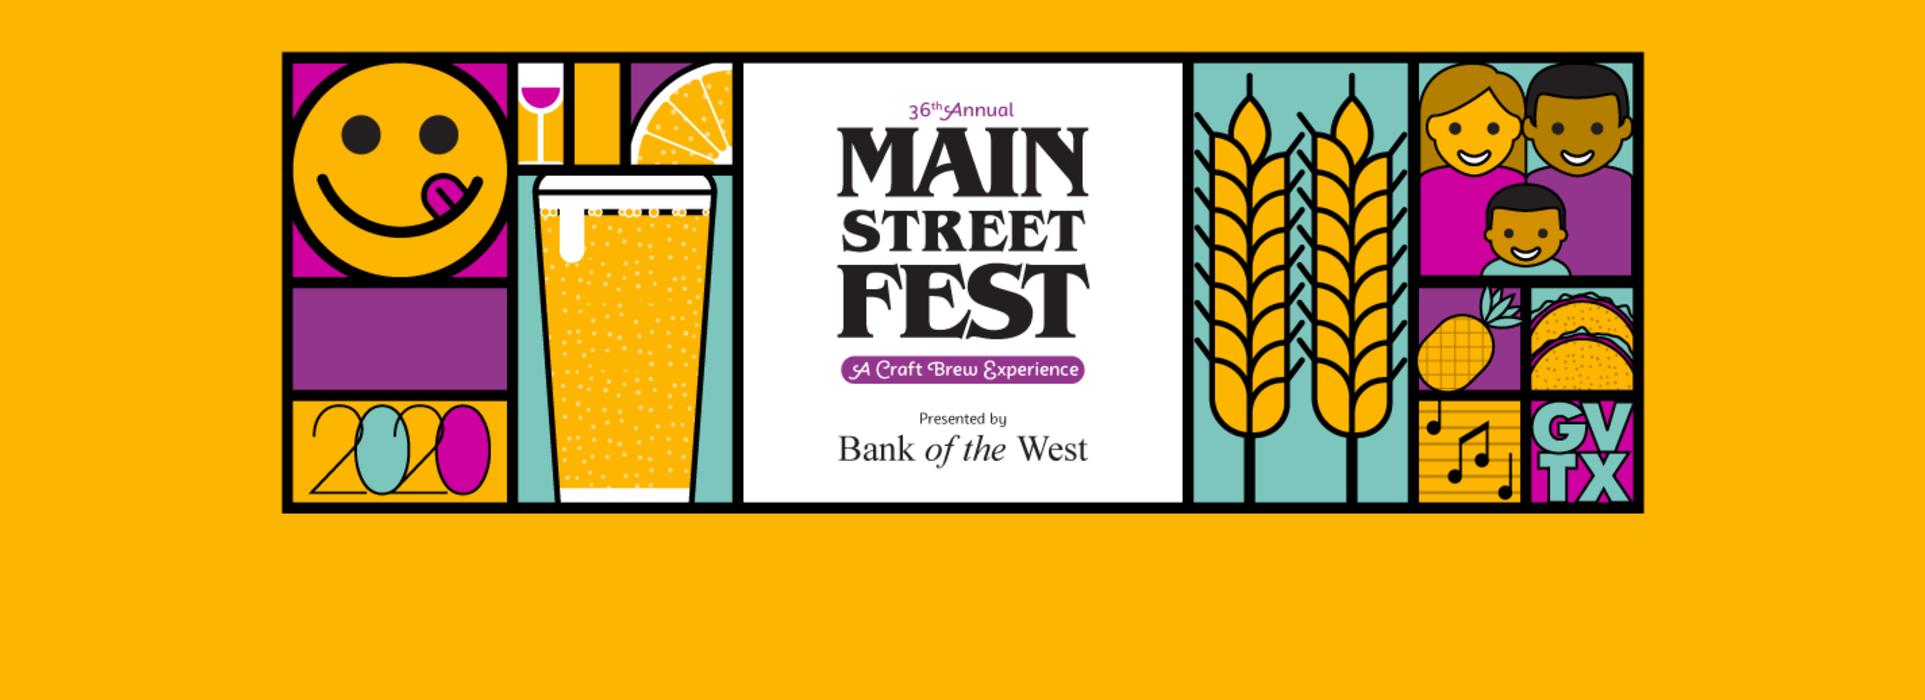 Main Street Fest Grapevine 2020